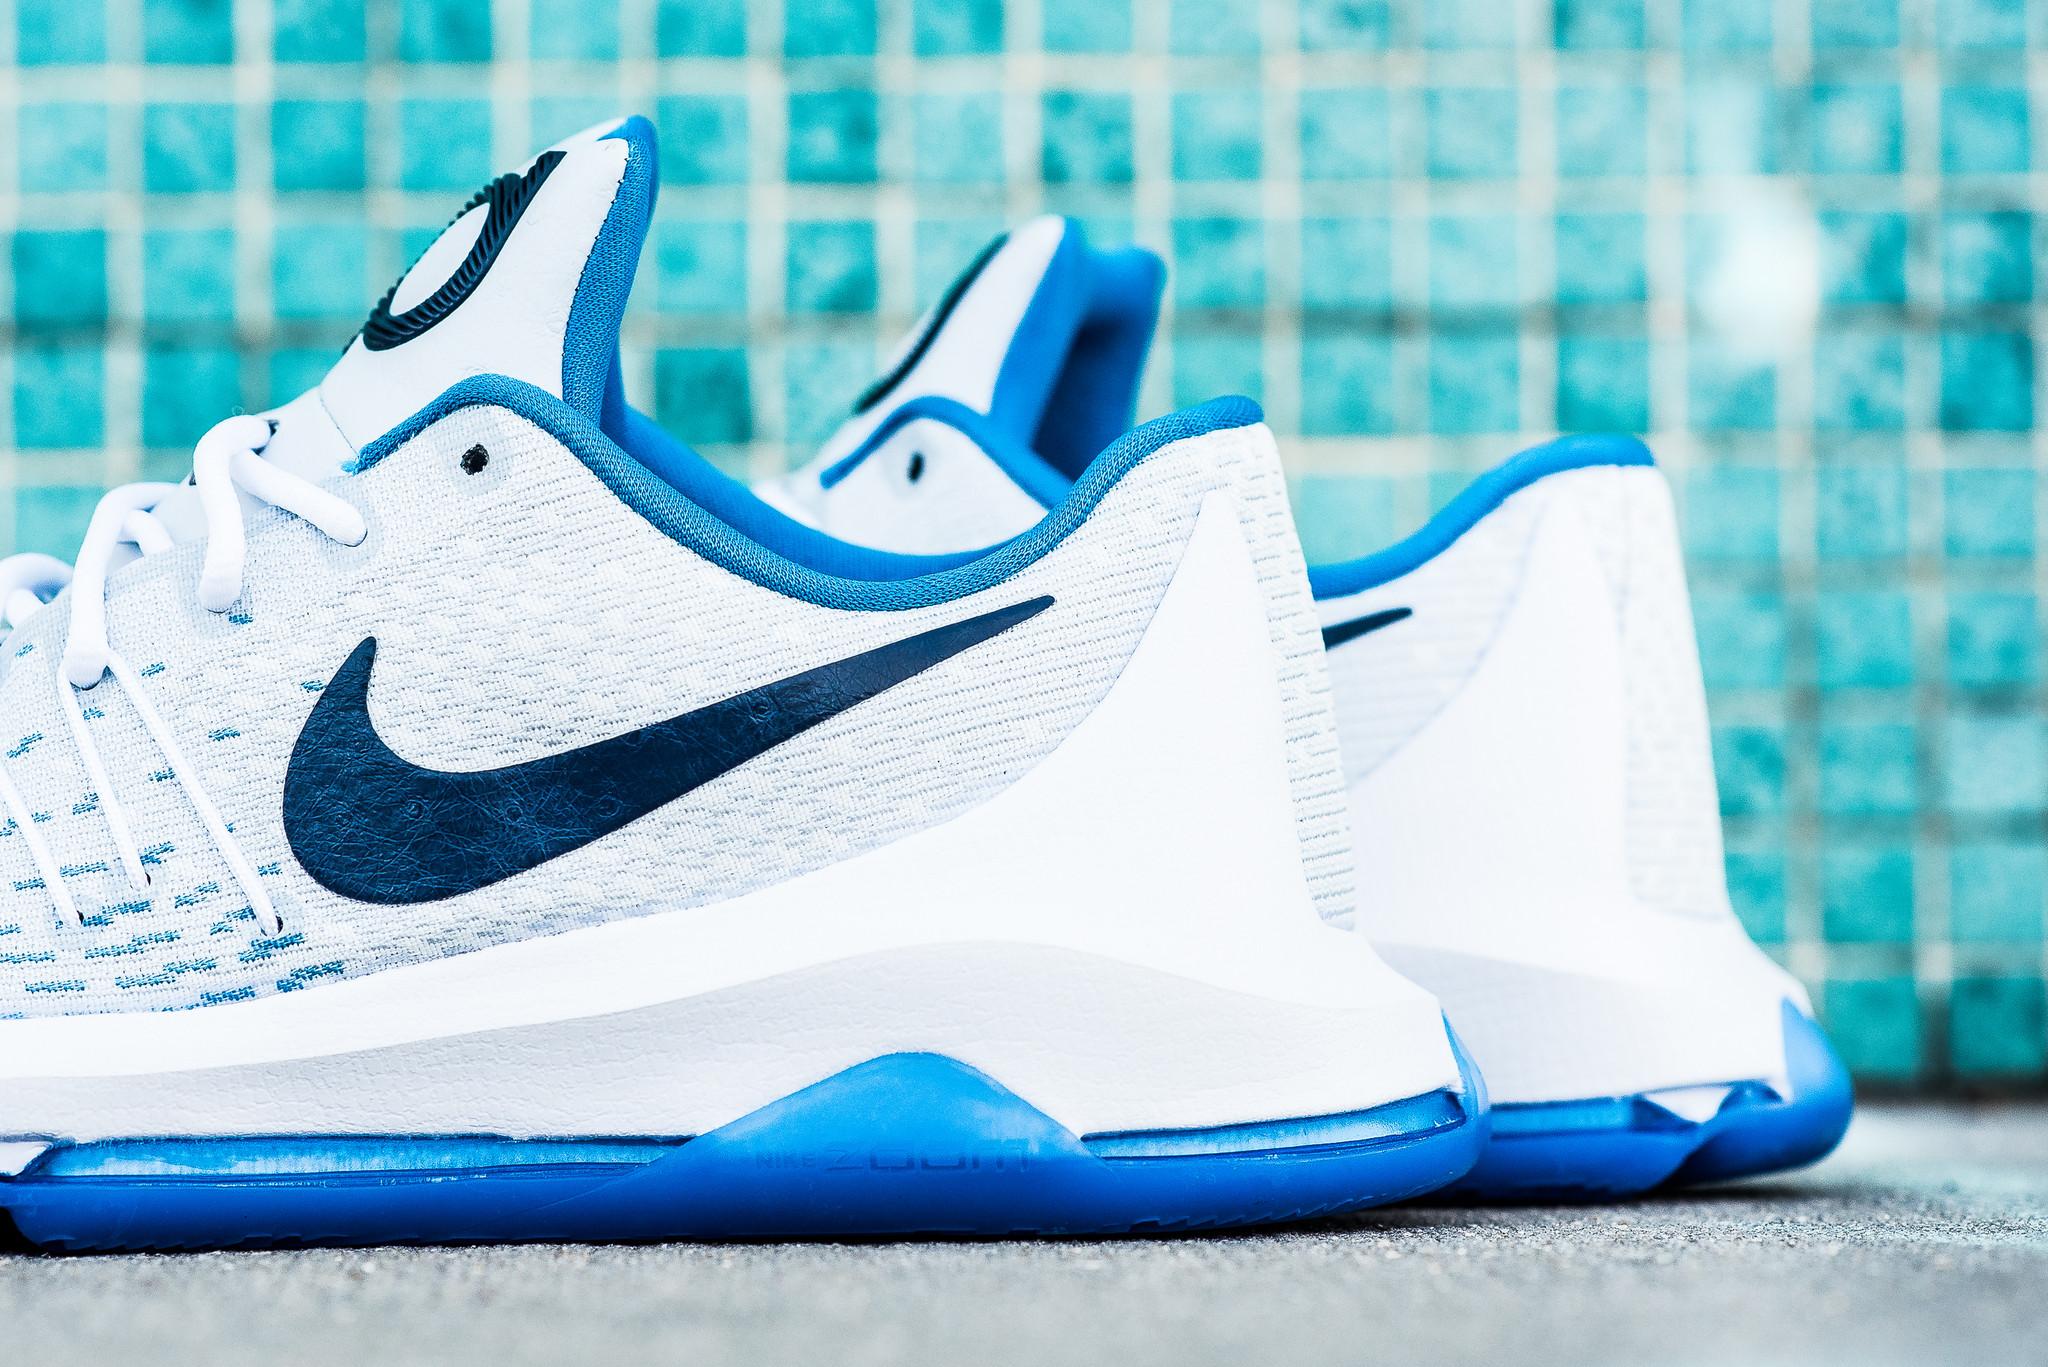 Nike_KD_8_White_Blue_Royal_Sneaker_Politics_Hypebeast_3_17d0558e-1698-4160-b134-6a6aef58f627